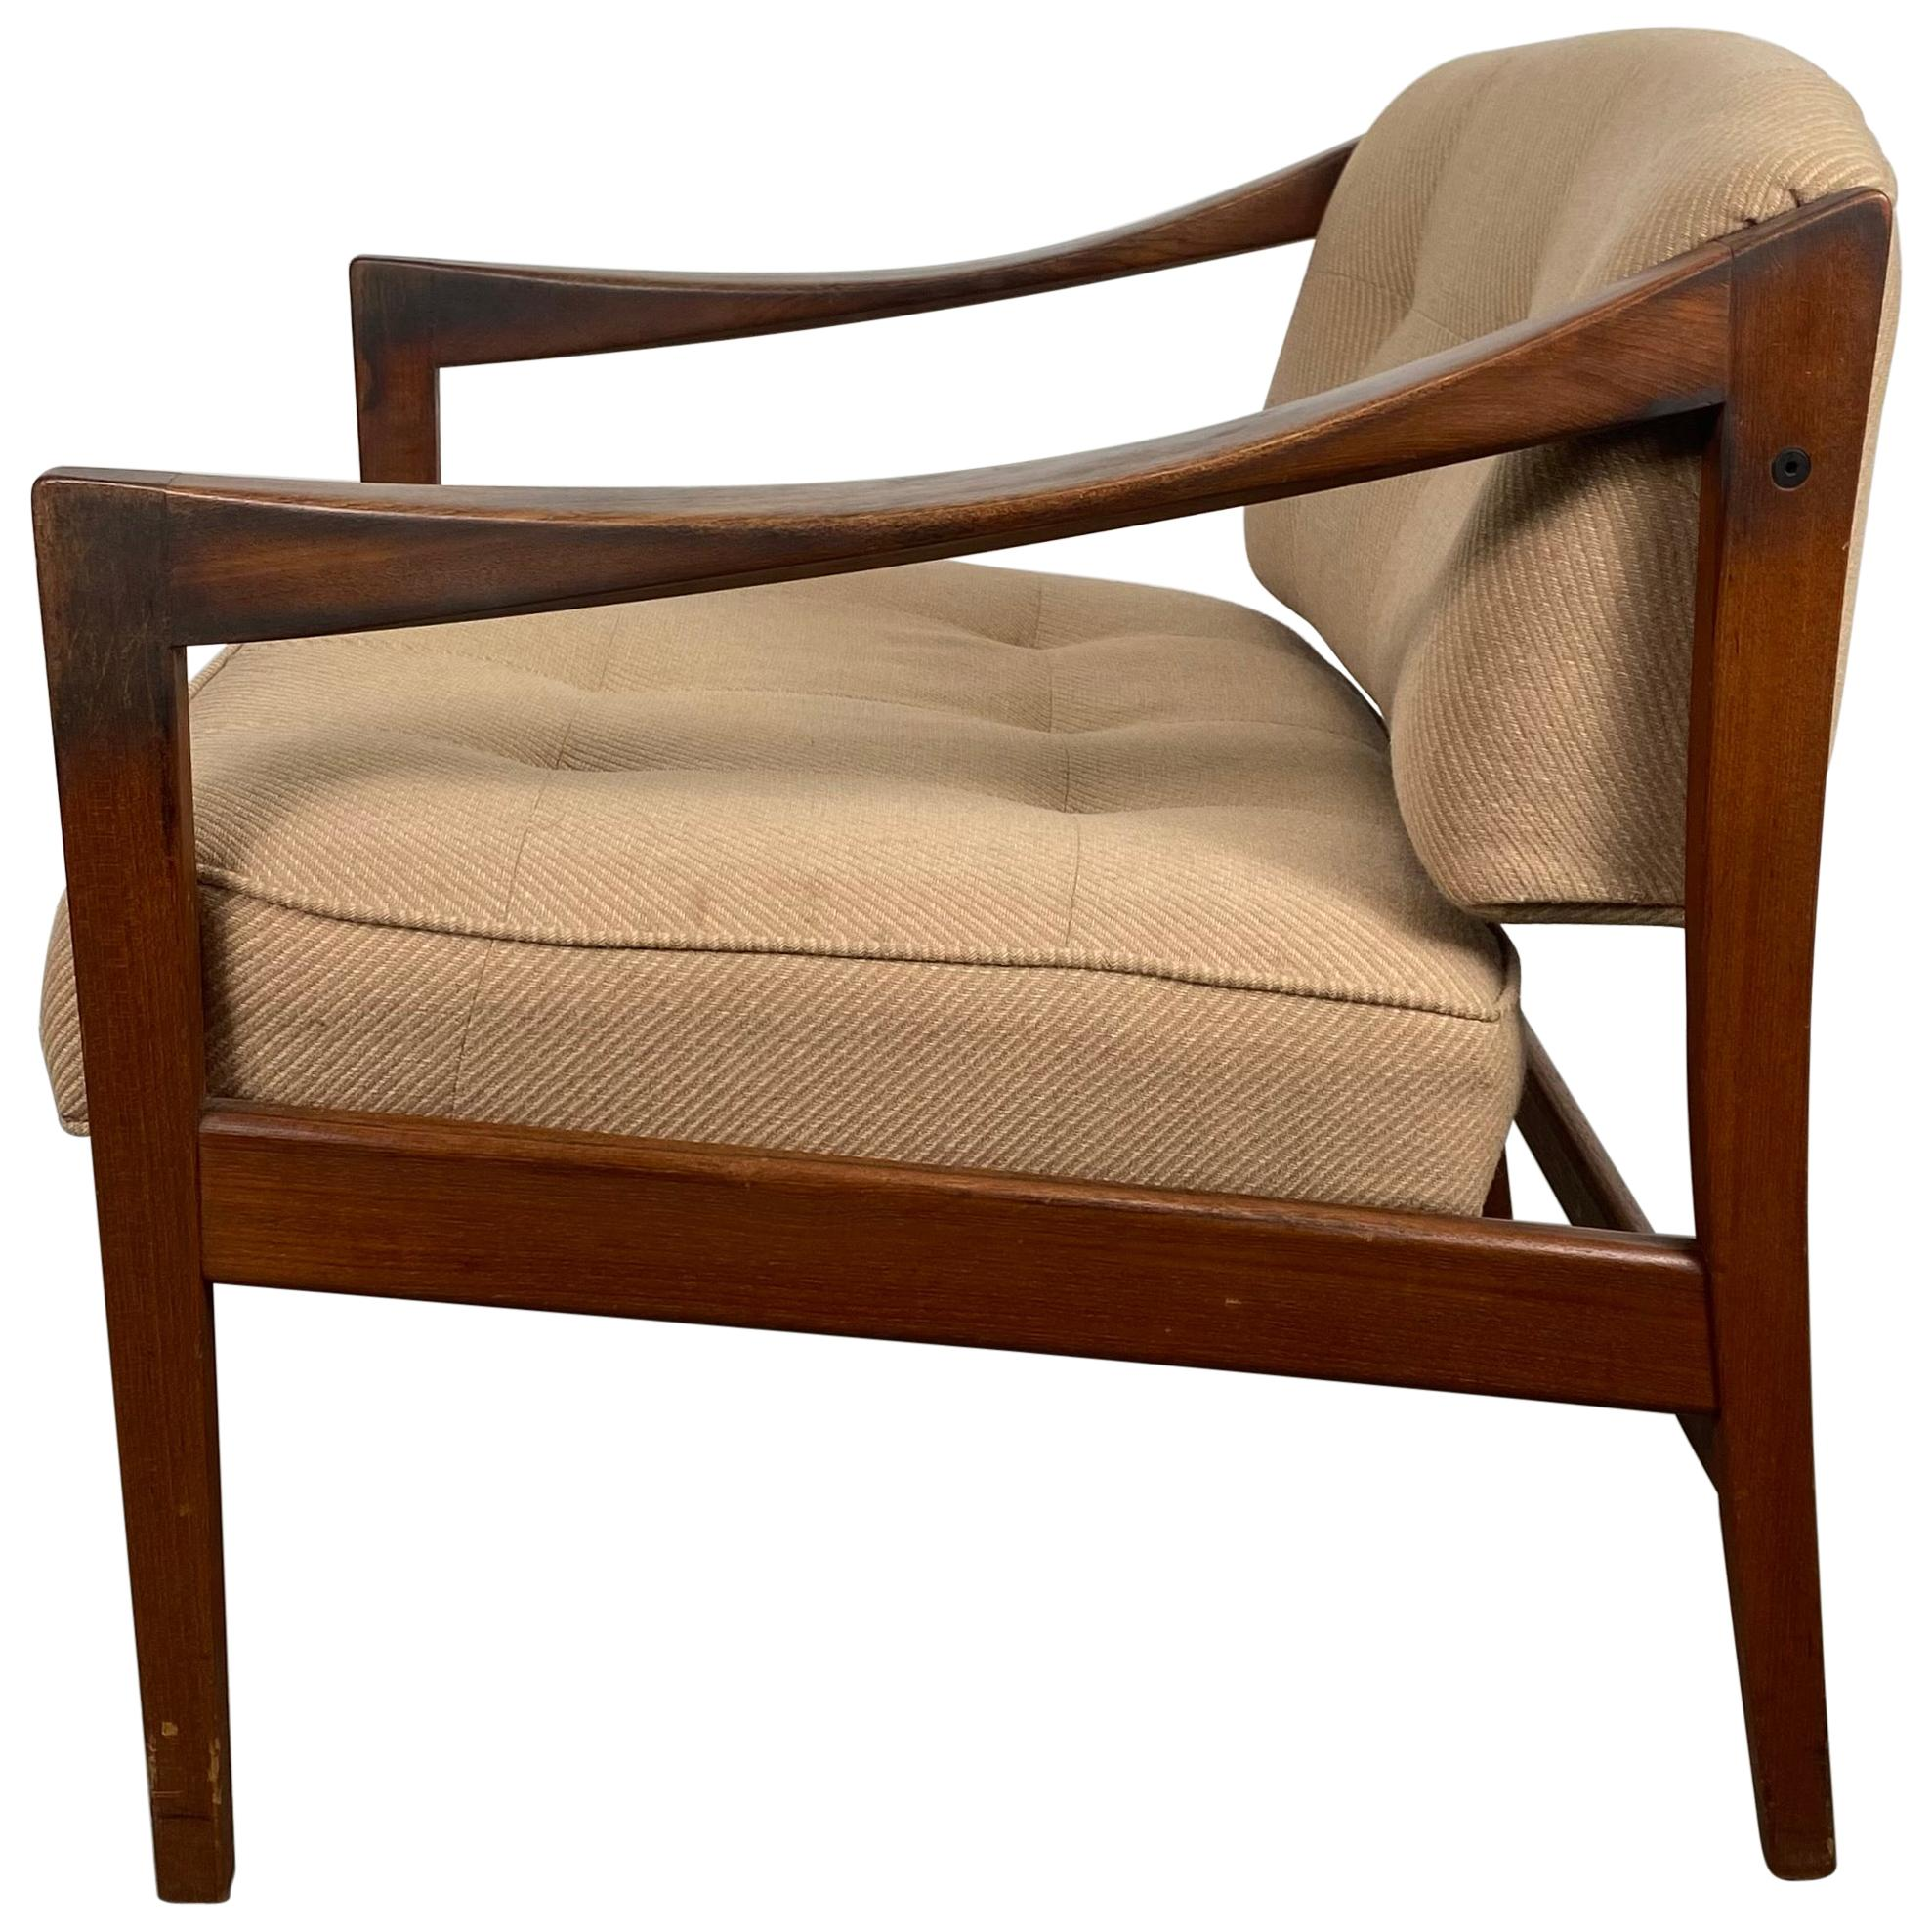 Classic Scandinavian Modern Walnut Lounge Chair by Dux, Sweden